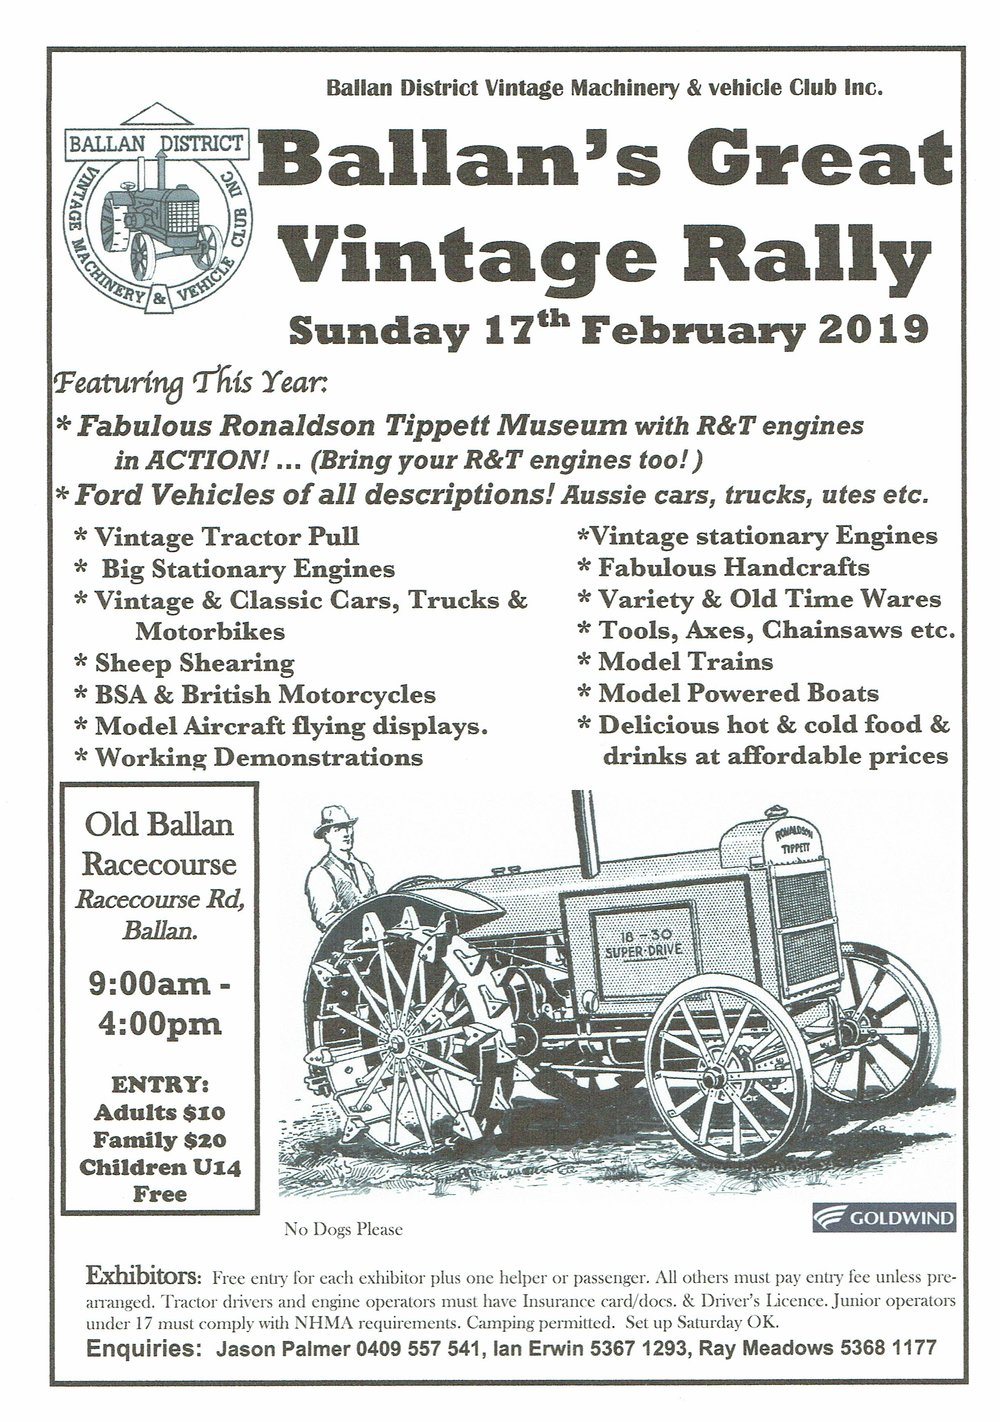 Ballan's Great Vintage Rally Flyer 2019.jpg